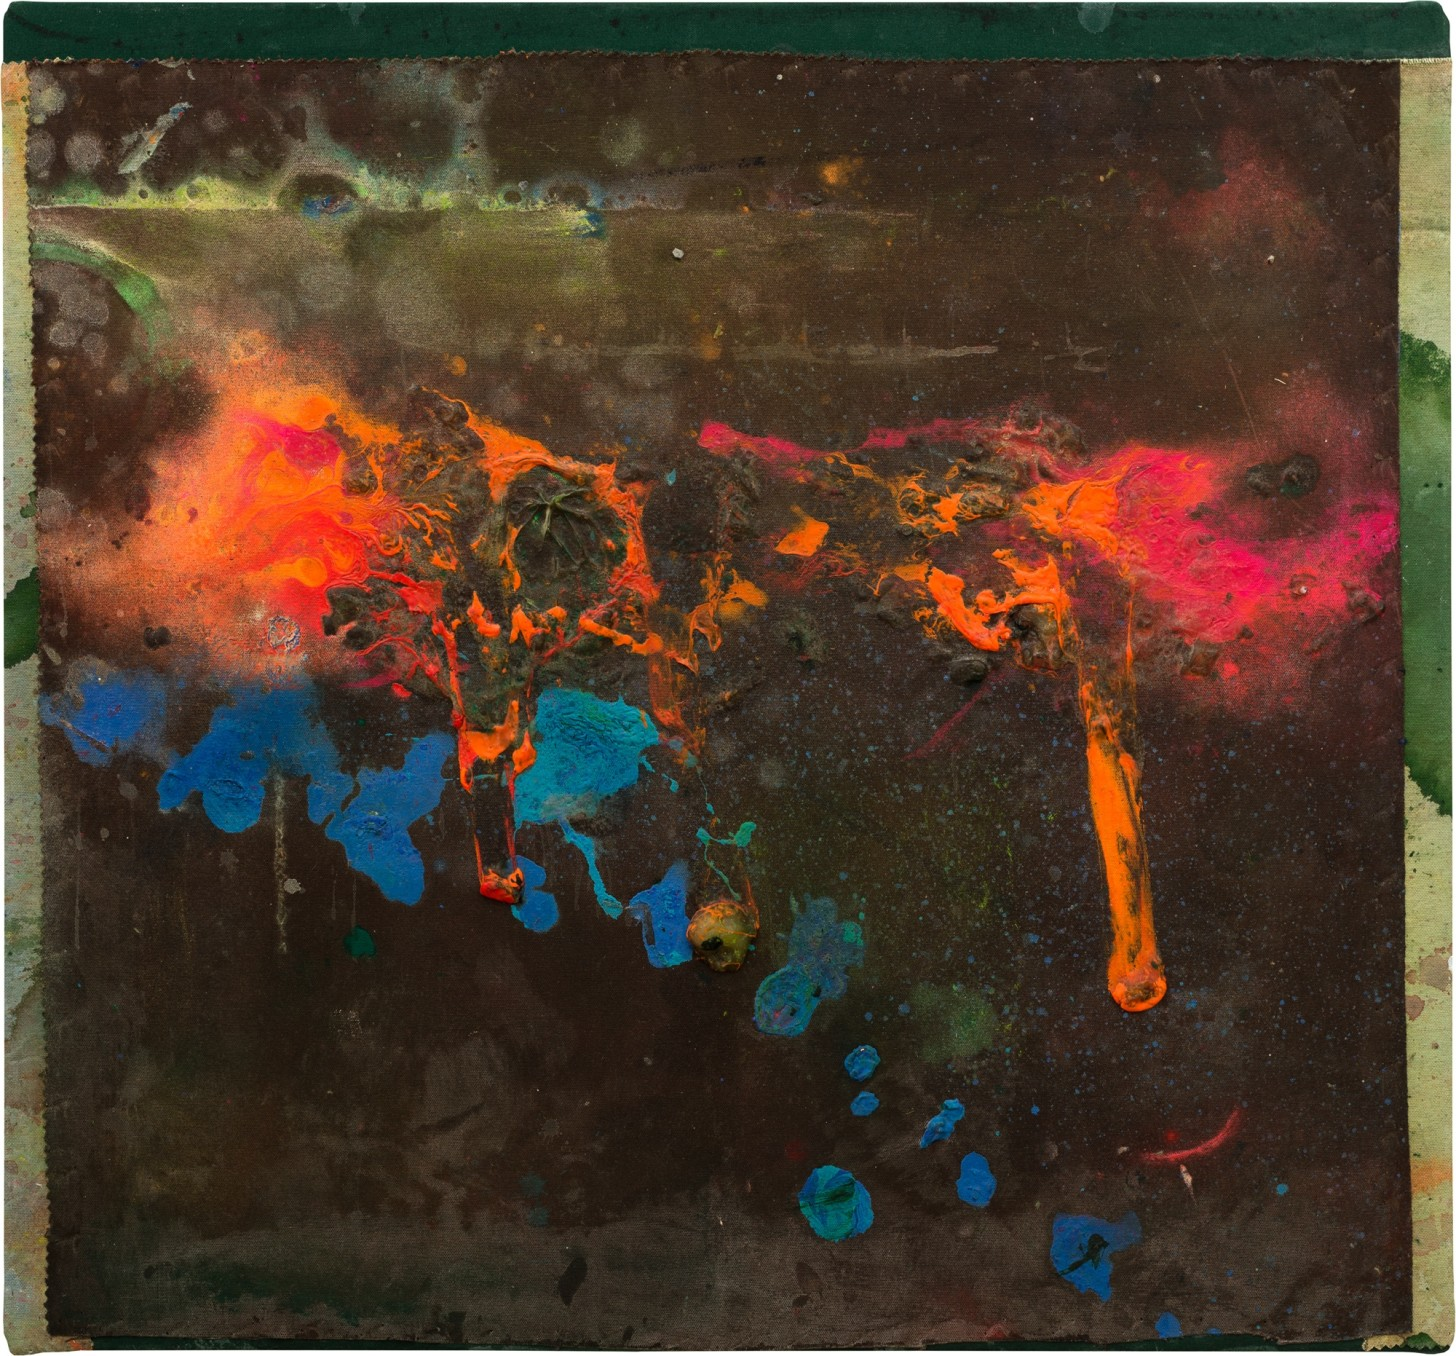 Frank Bowling, Cyclist, 2017, Acrylic on collaged canvas, 59.3 x 64.6 cm, 25 1/2 x 23 3/8 in